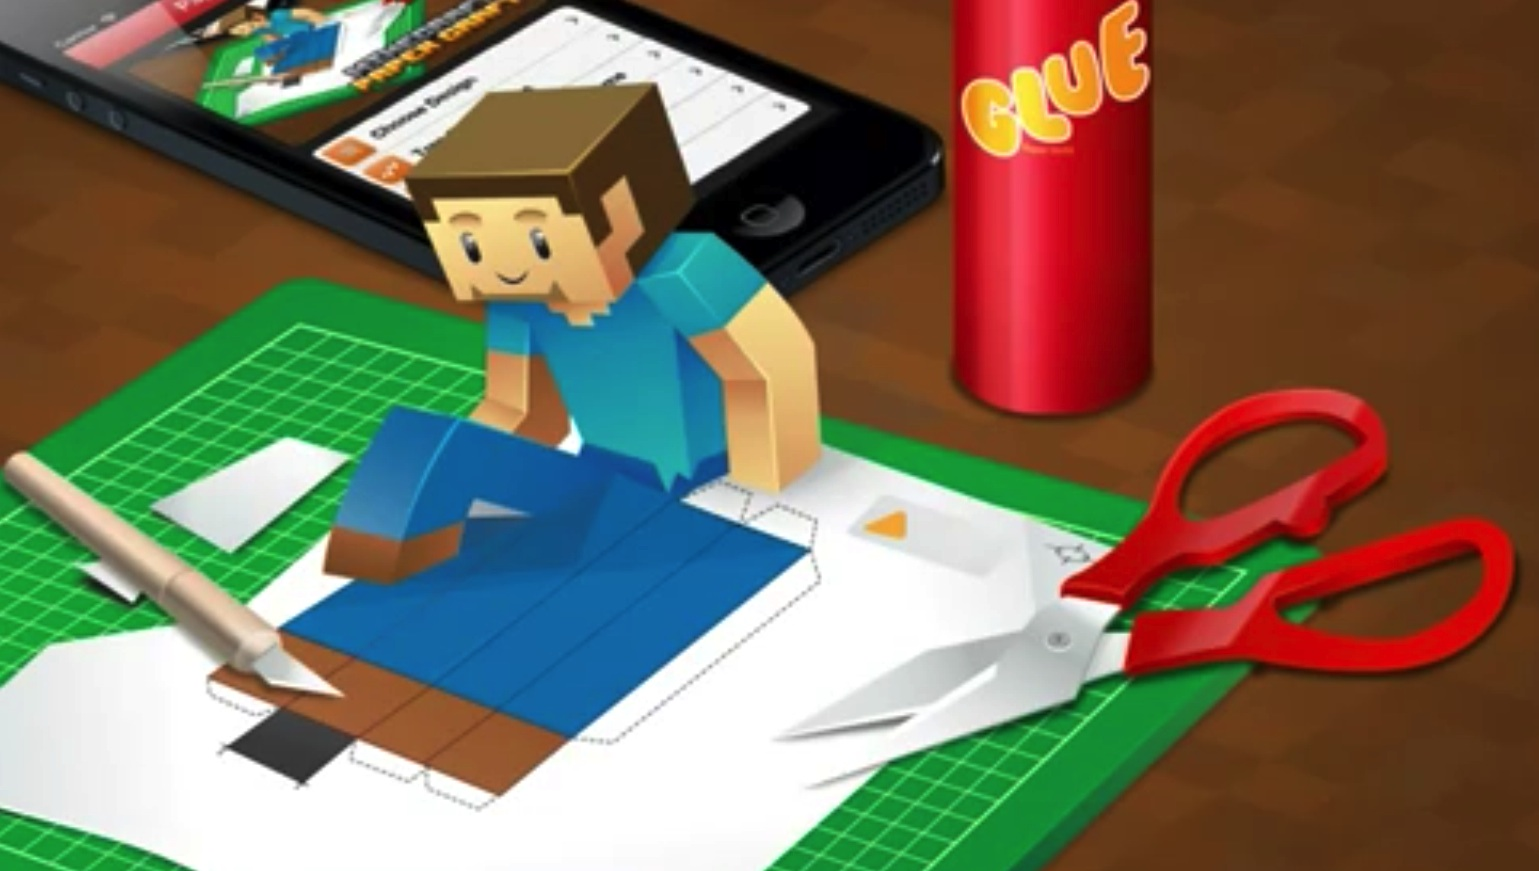 скачать на андроид майнкрафт papercraft studio #10